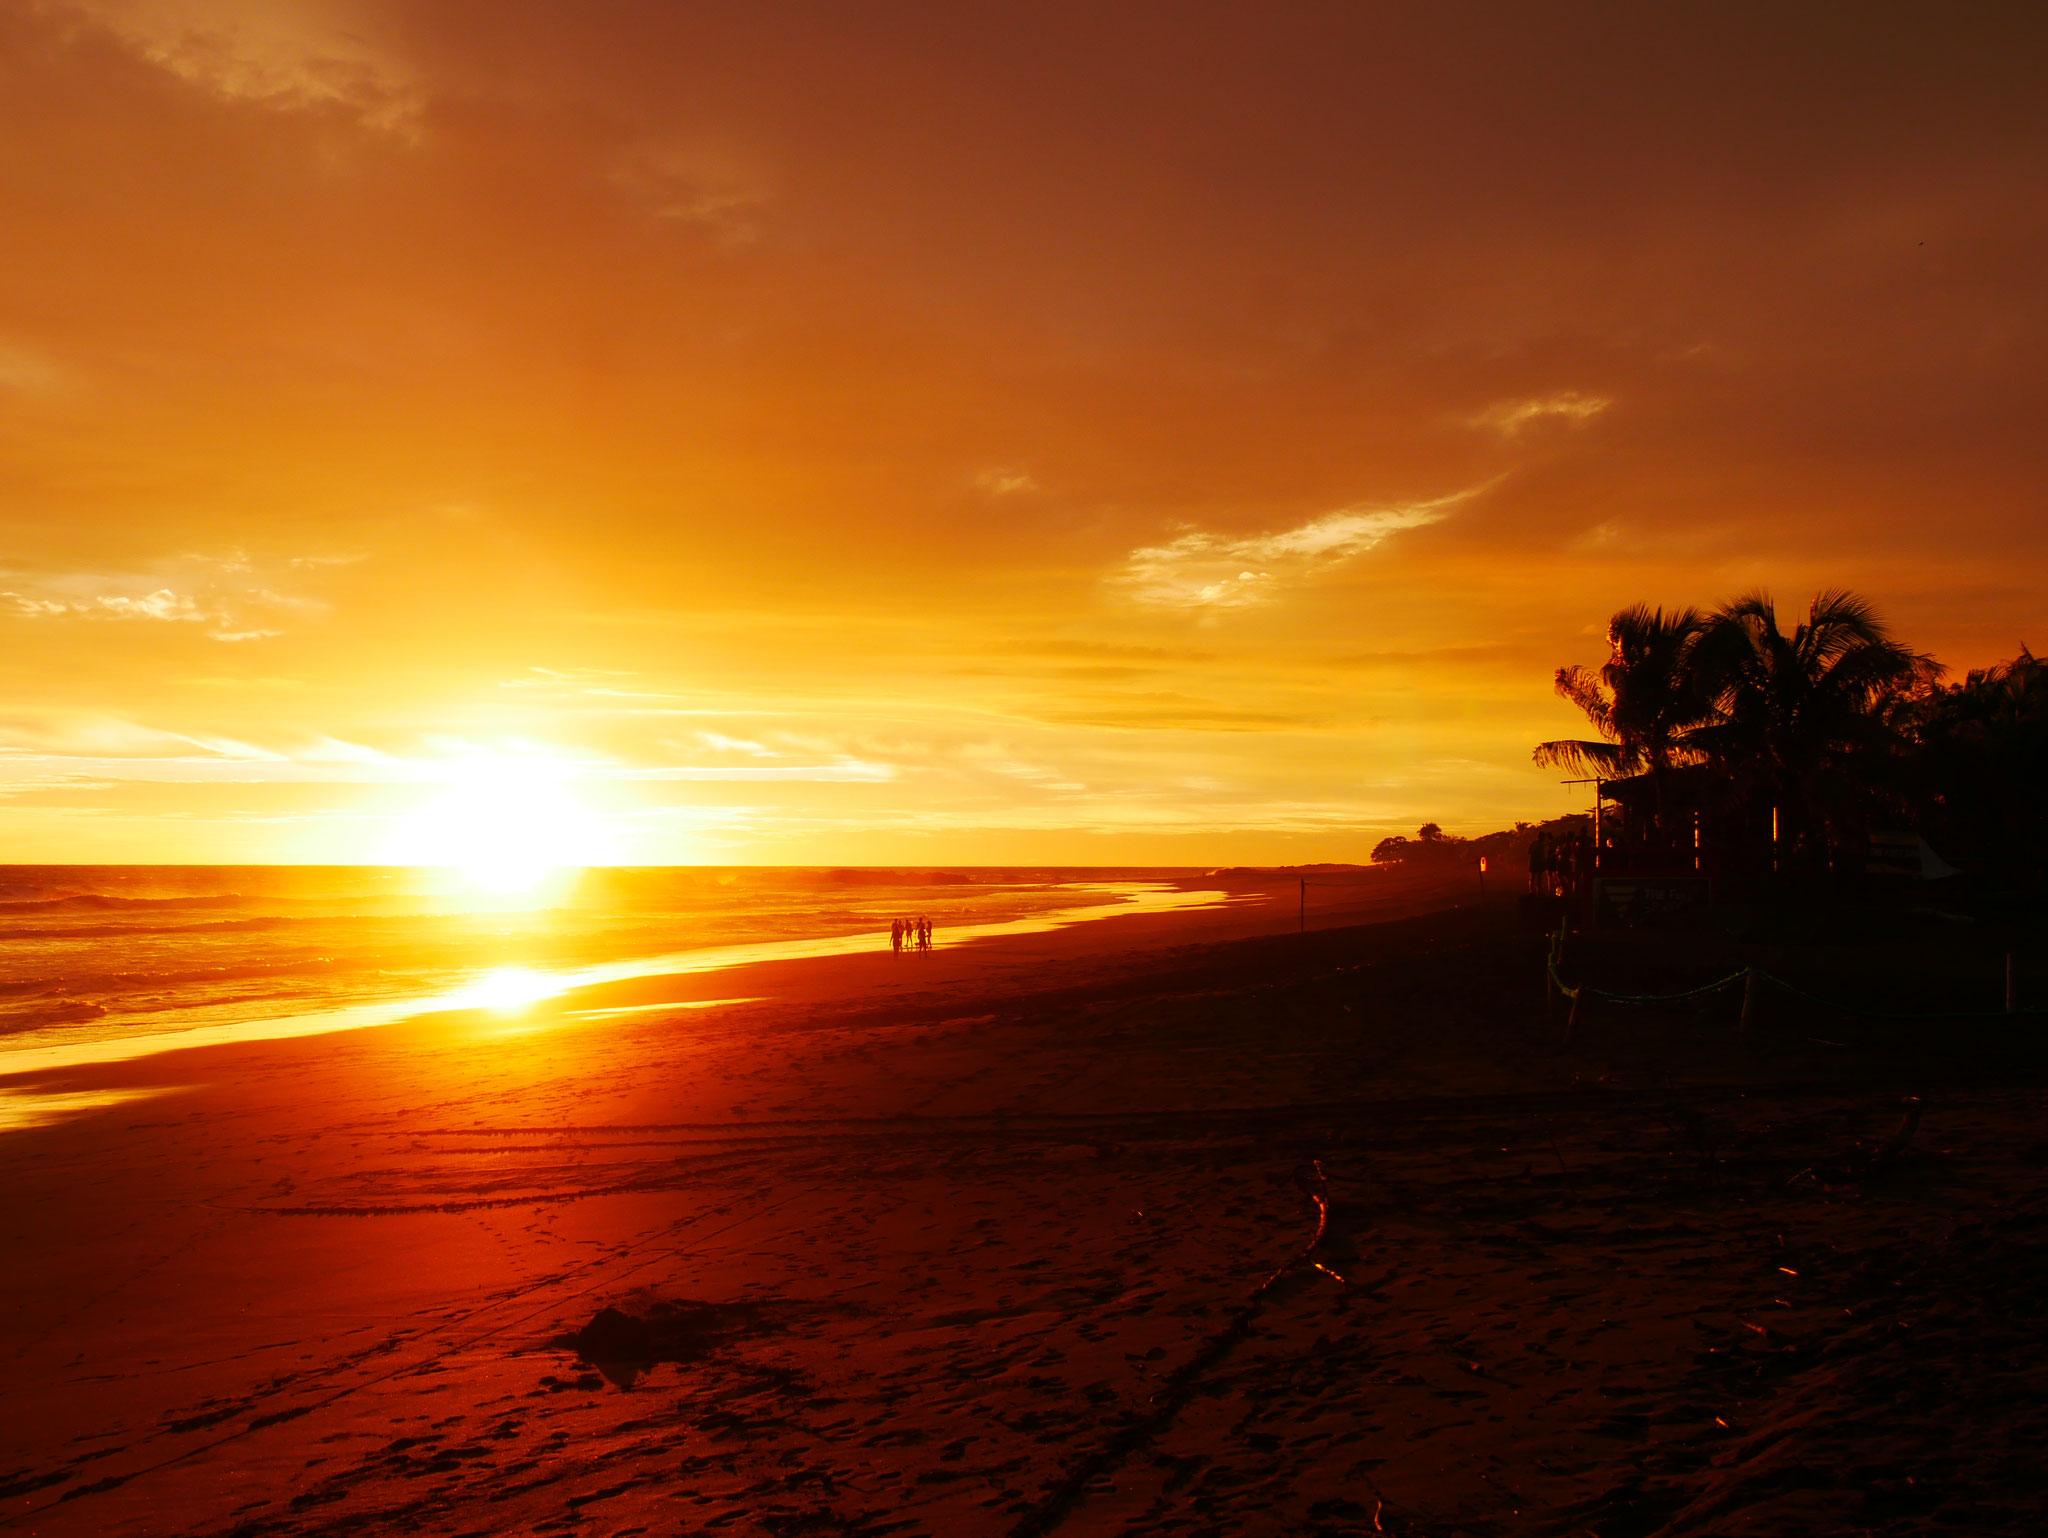 Sunset Playa El Transito, Nicaragua